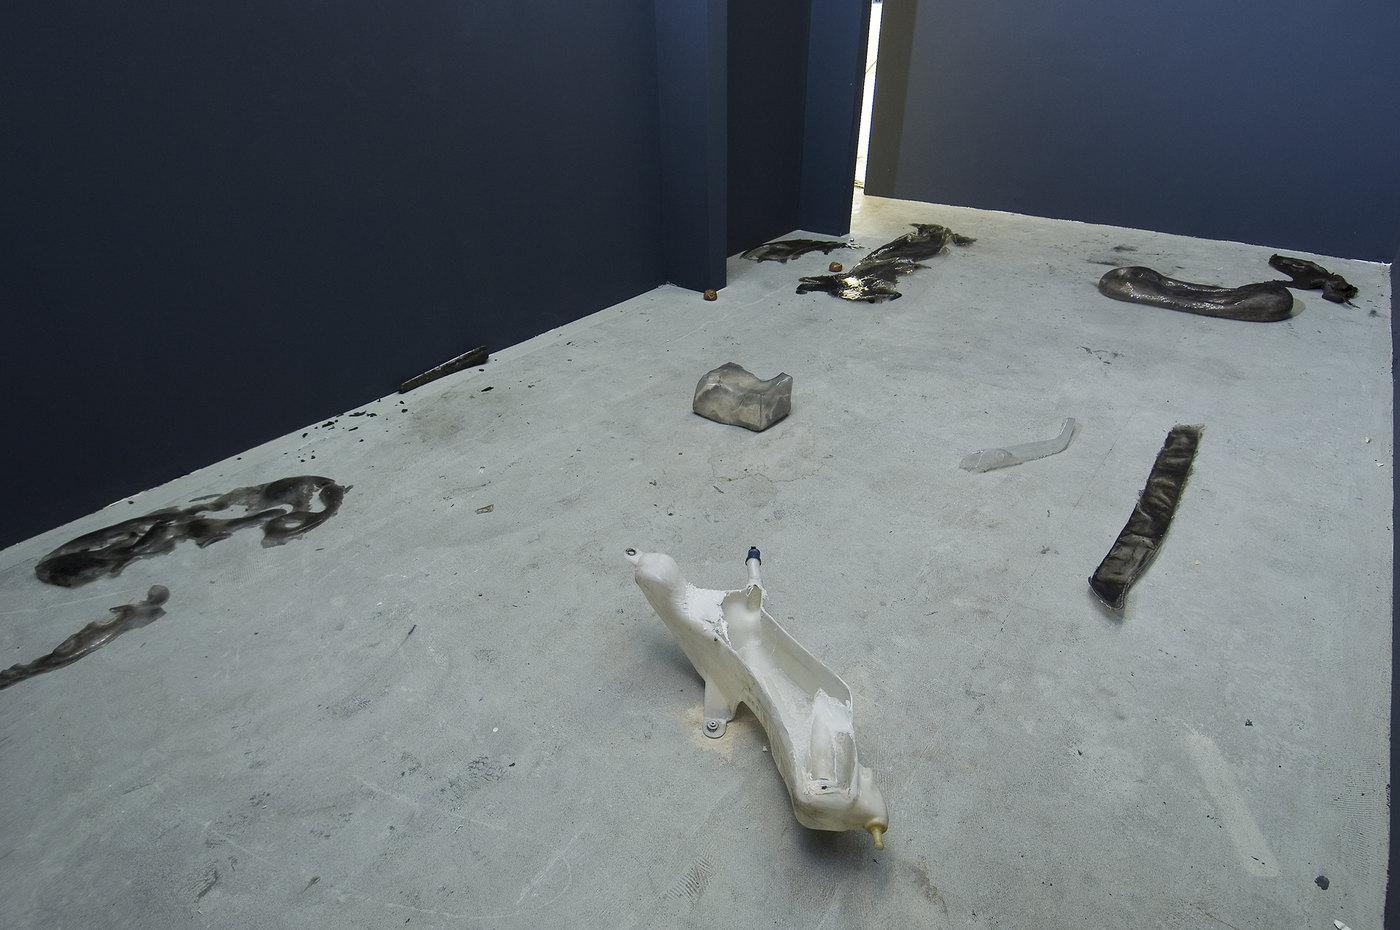 6 Giulia Cenci, Untitled (ash bones, plaster, graphite powder, silicon rubber, natural asphalt, bones char, fresh fruits, car's fragments plyester resin), 2016